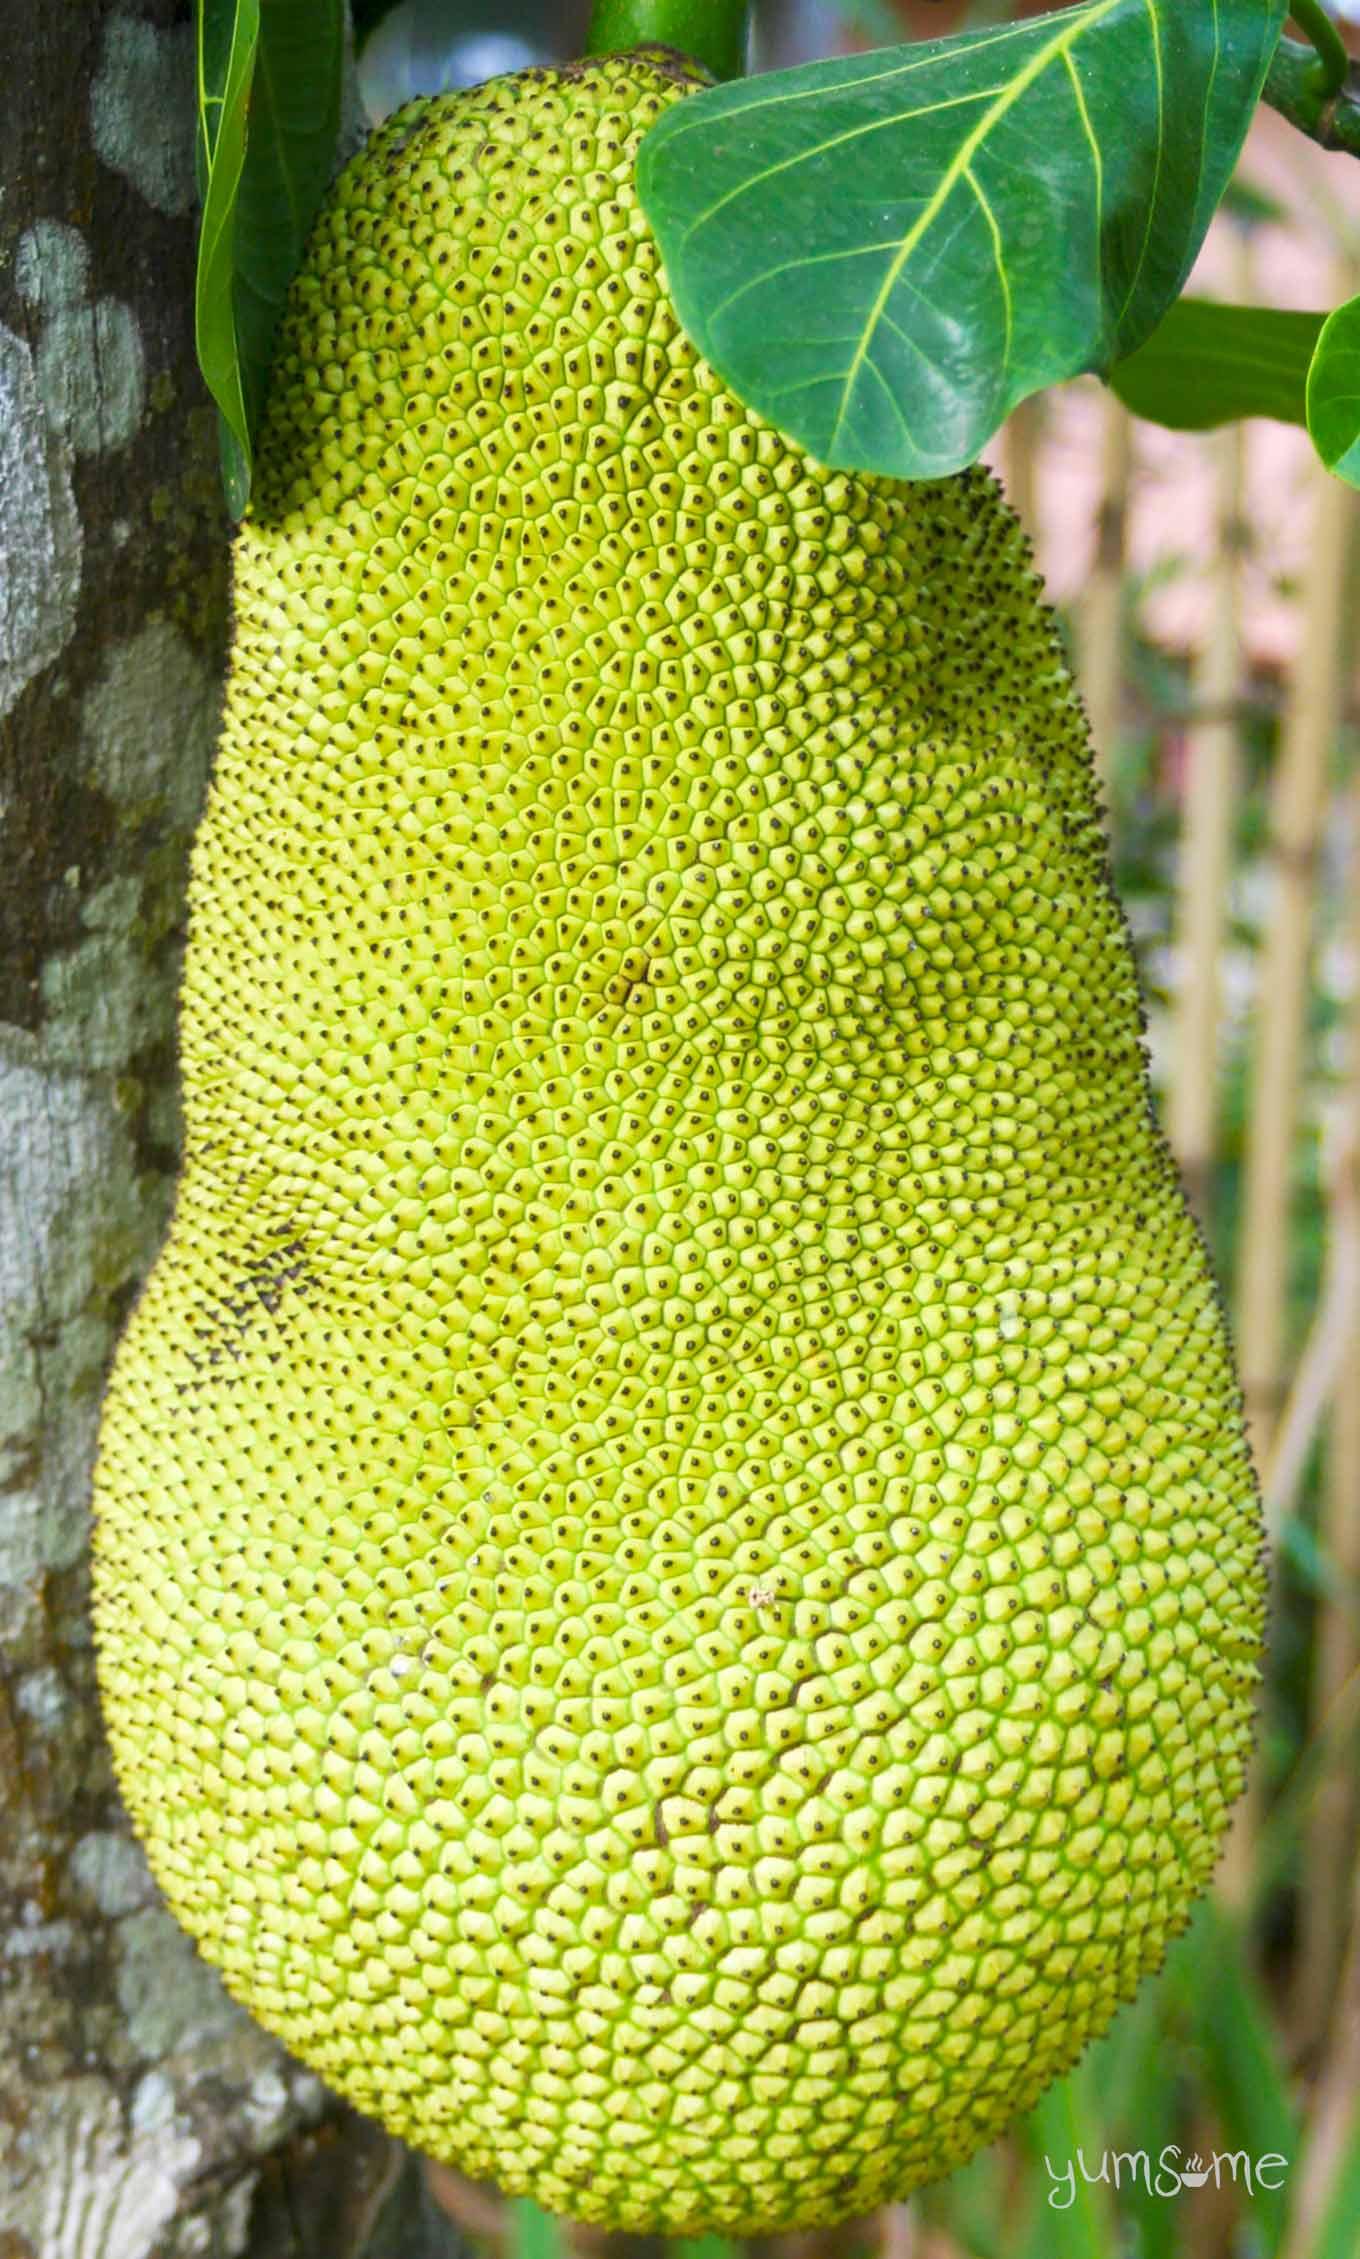 jackfruit in Doi Saket, Thailand | yumsome.com